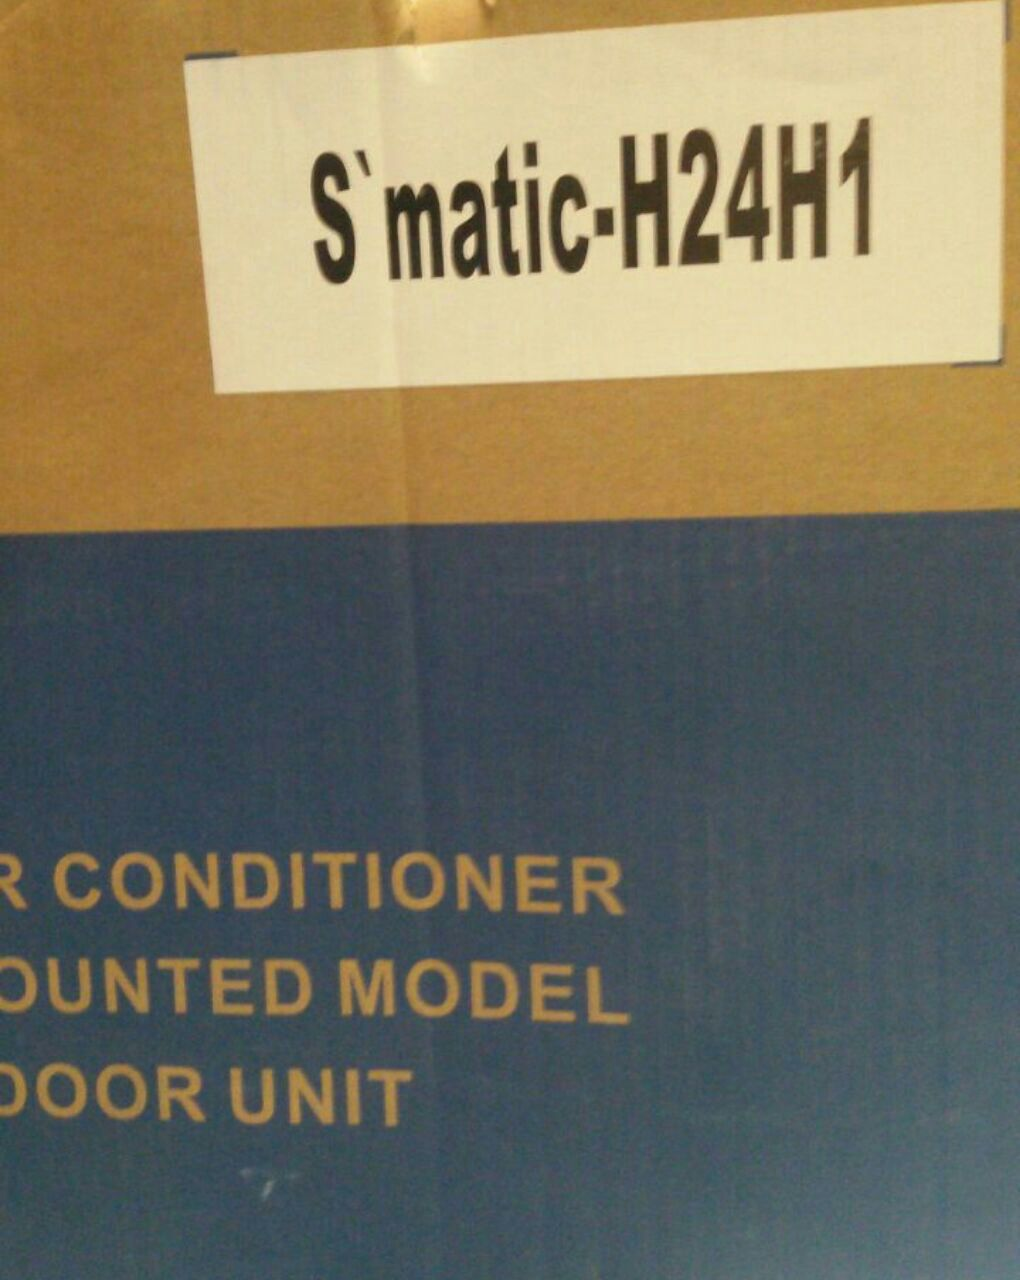 اسپیلت کولر گازی گری gree مدل اسماتیک S matic-h24h1ظرفیت 24 هزار